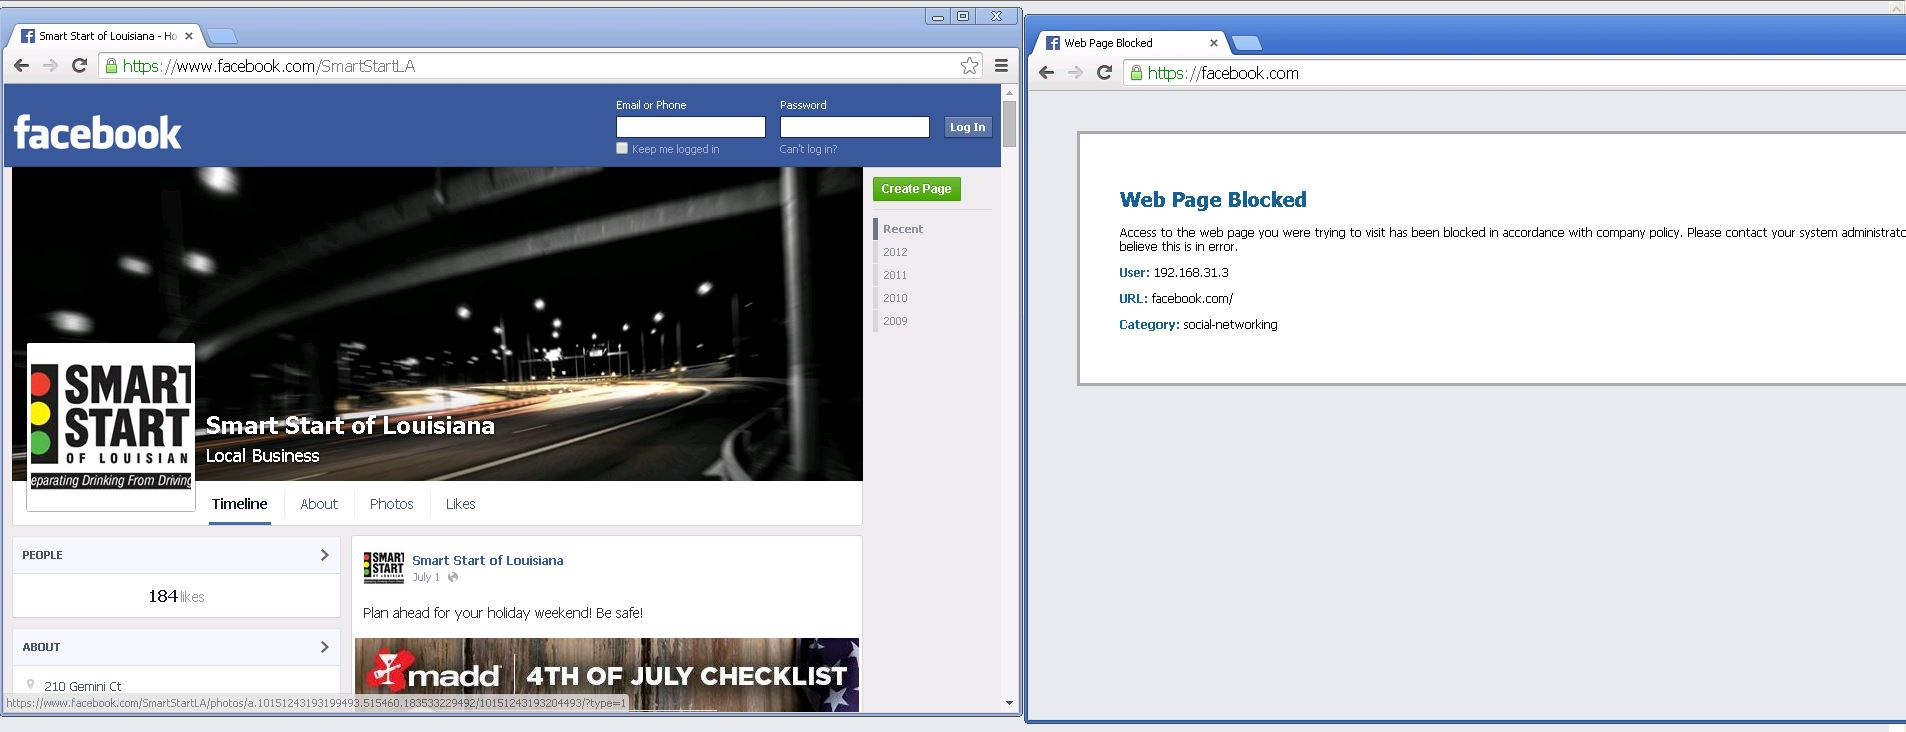 chrome-facebook.JPG